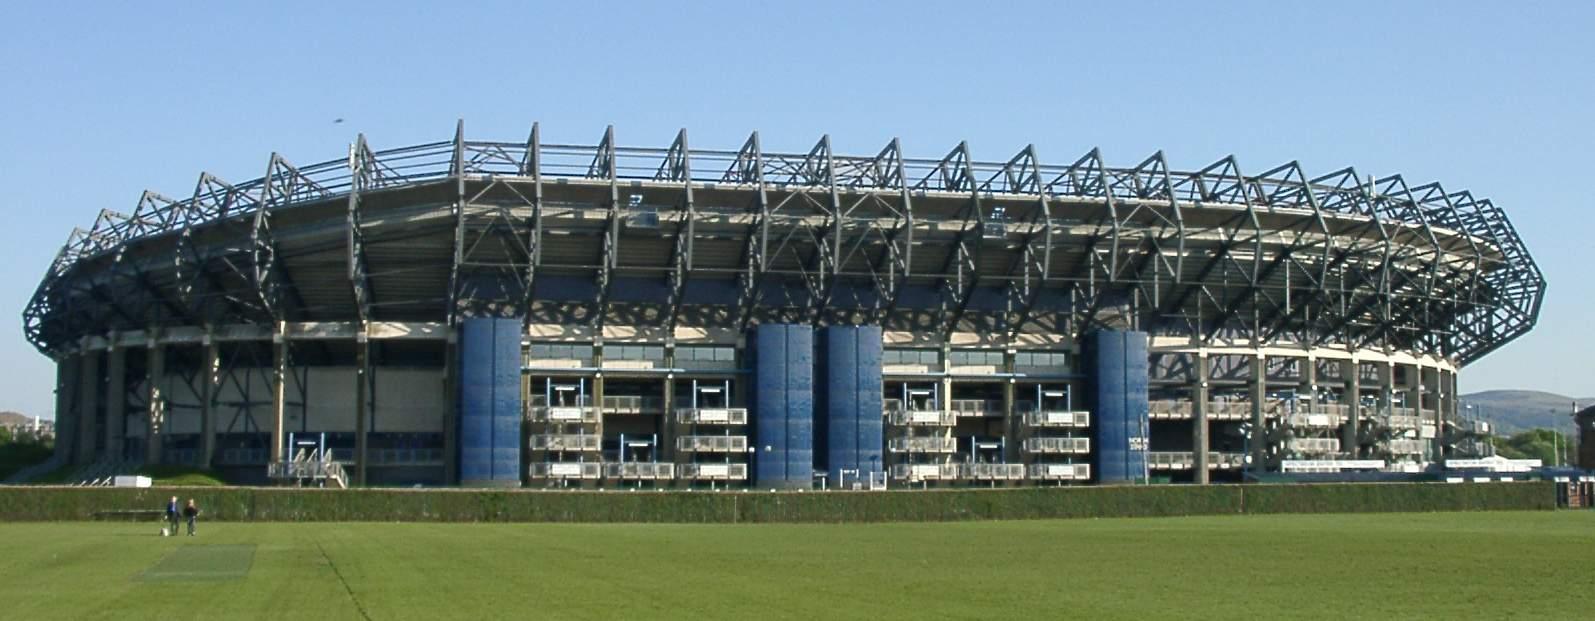 Ciao Murrayfield…l'Edimburgo trasloca al George Watson's College Ground Stadium